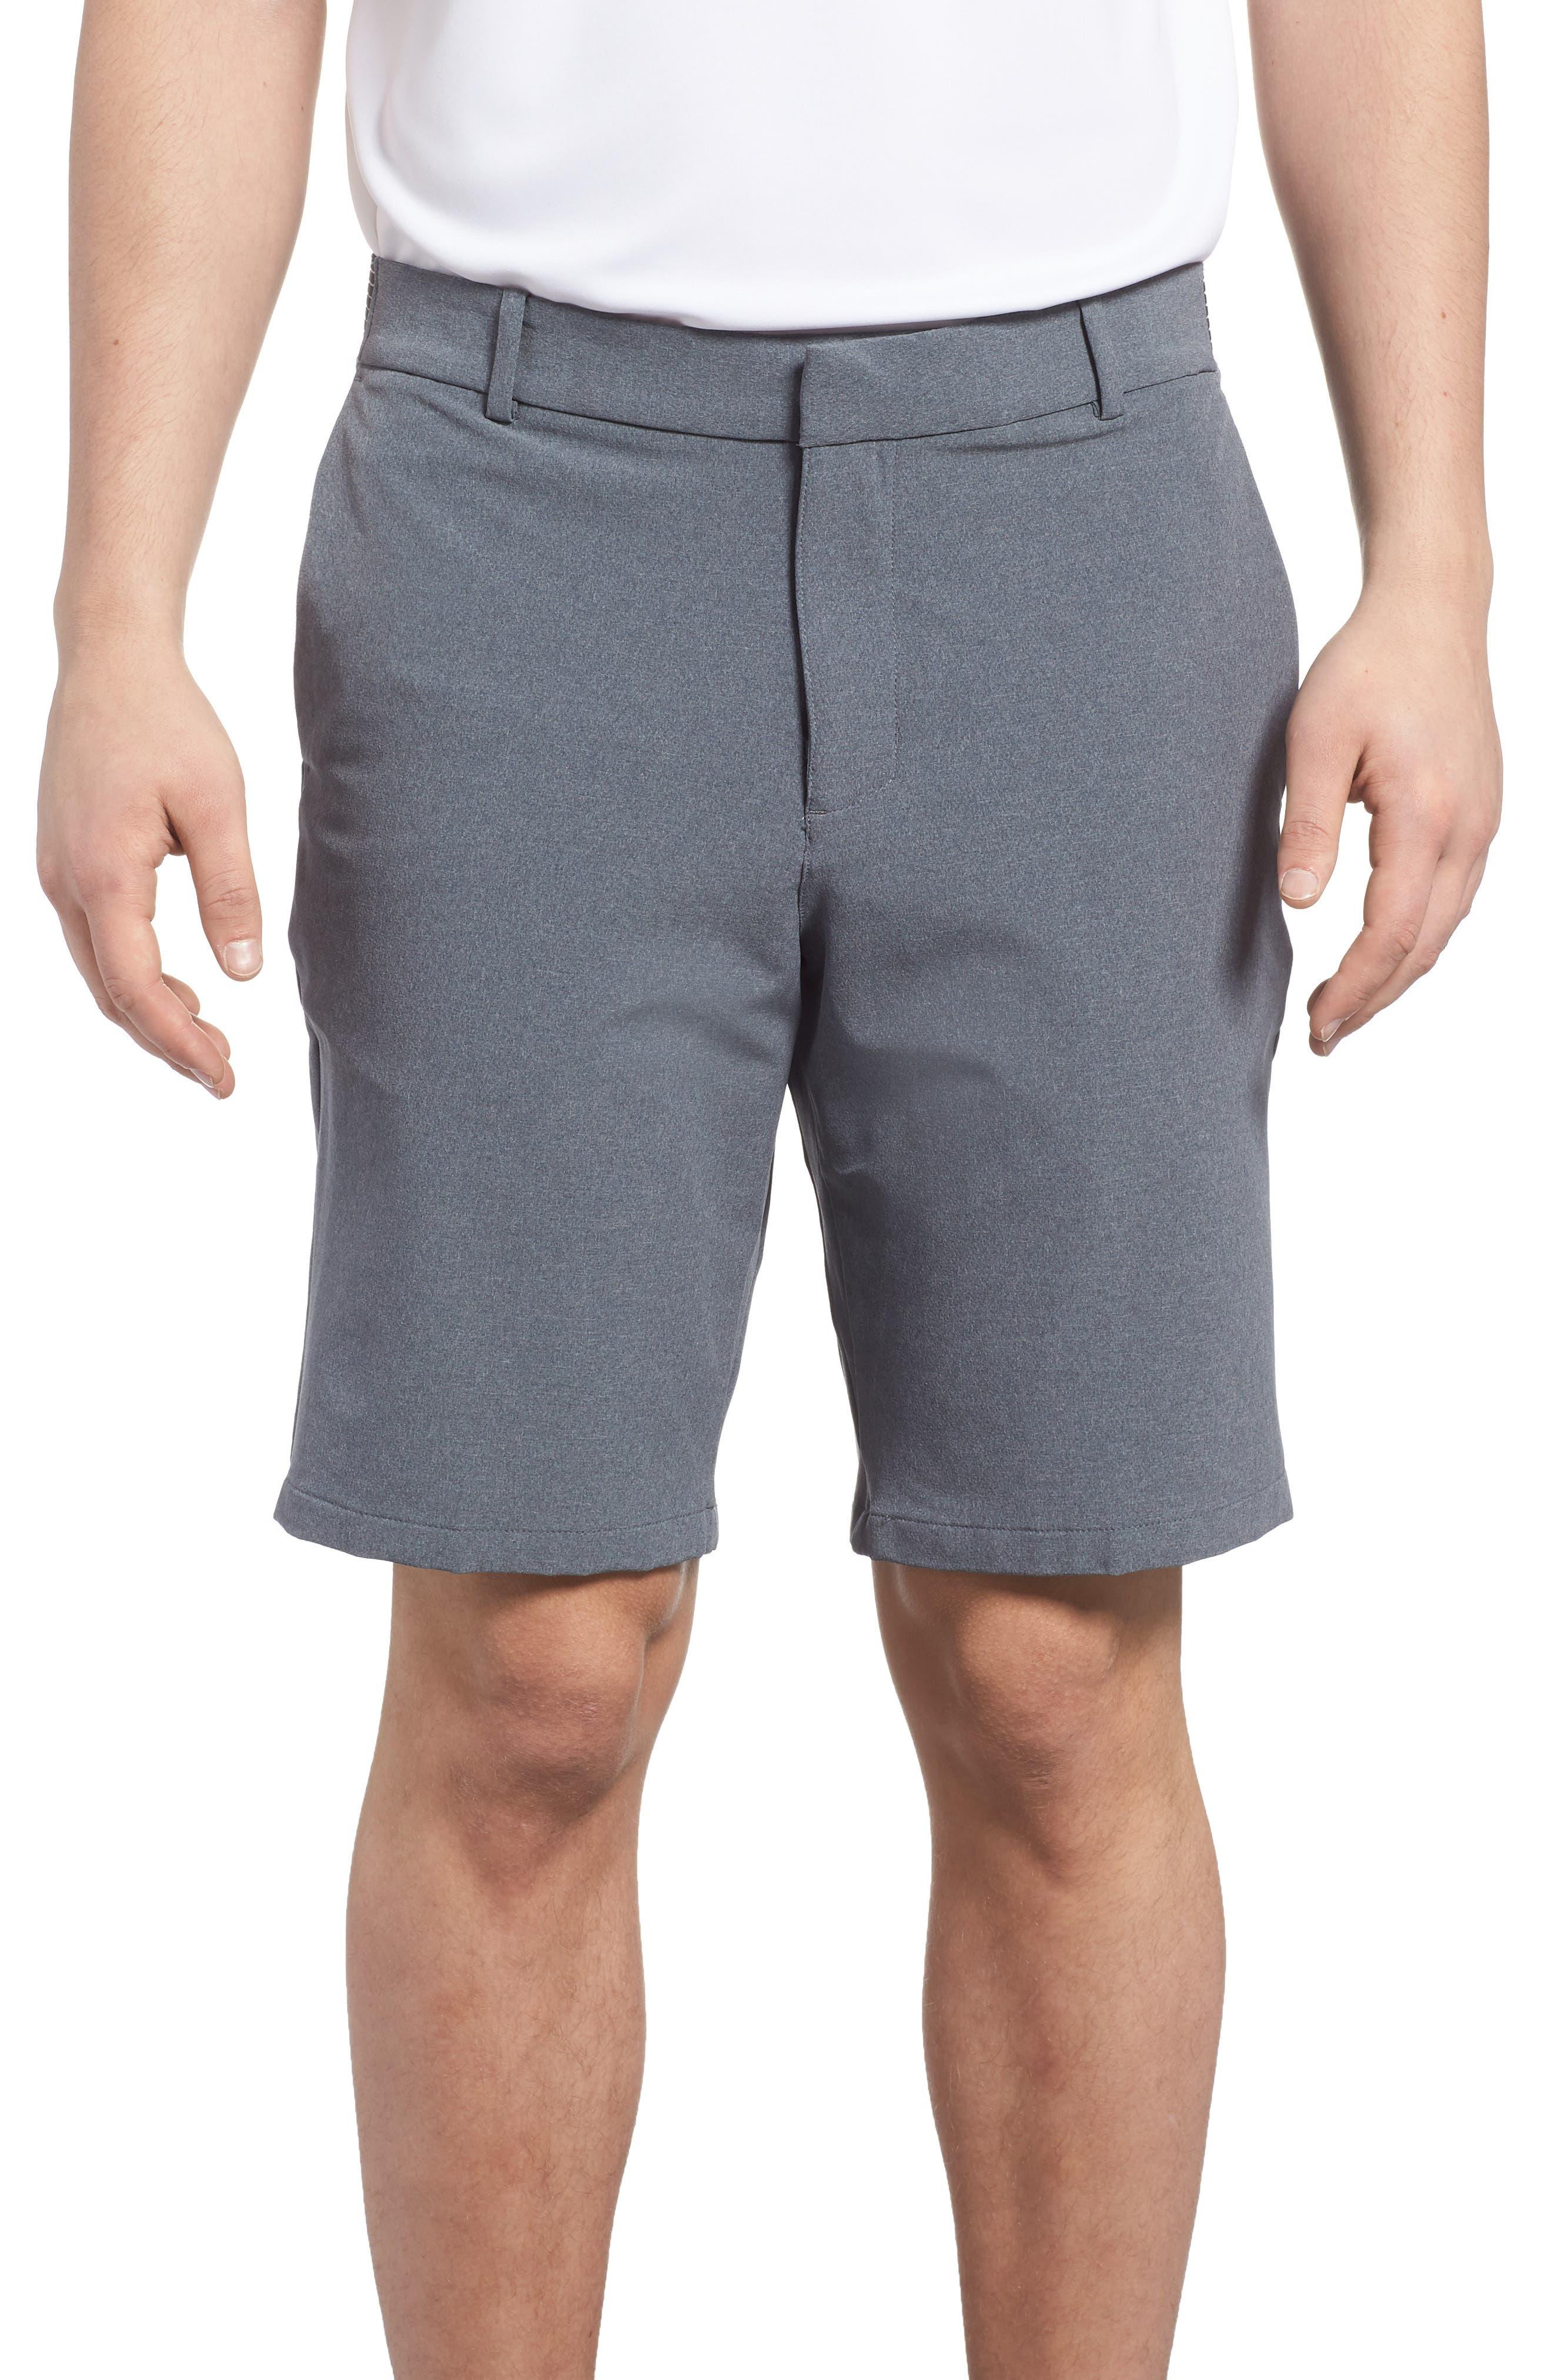 Dry Flex Slim Fit Golf Shorts,                             Main thumbnail 1, color,                             001